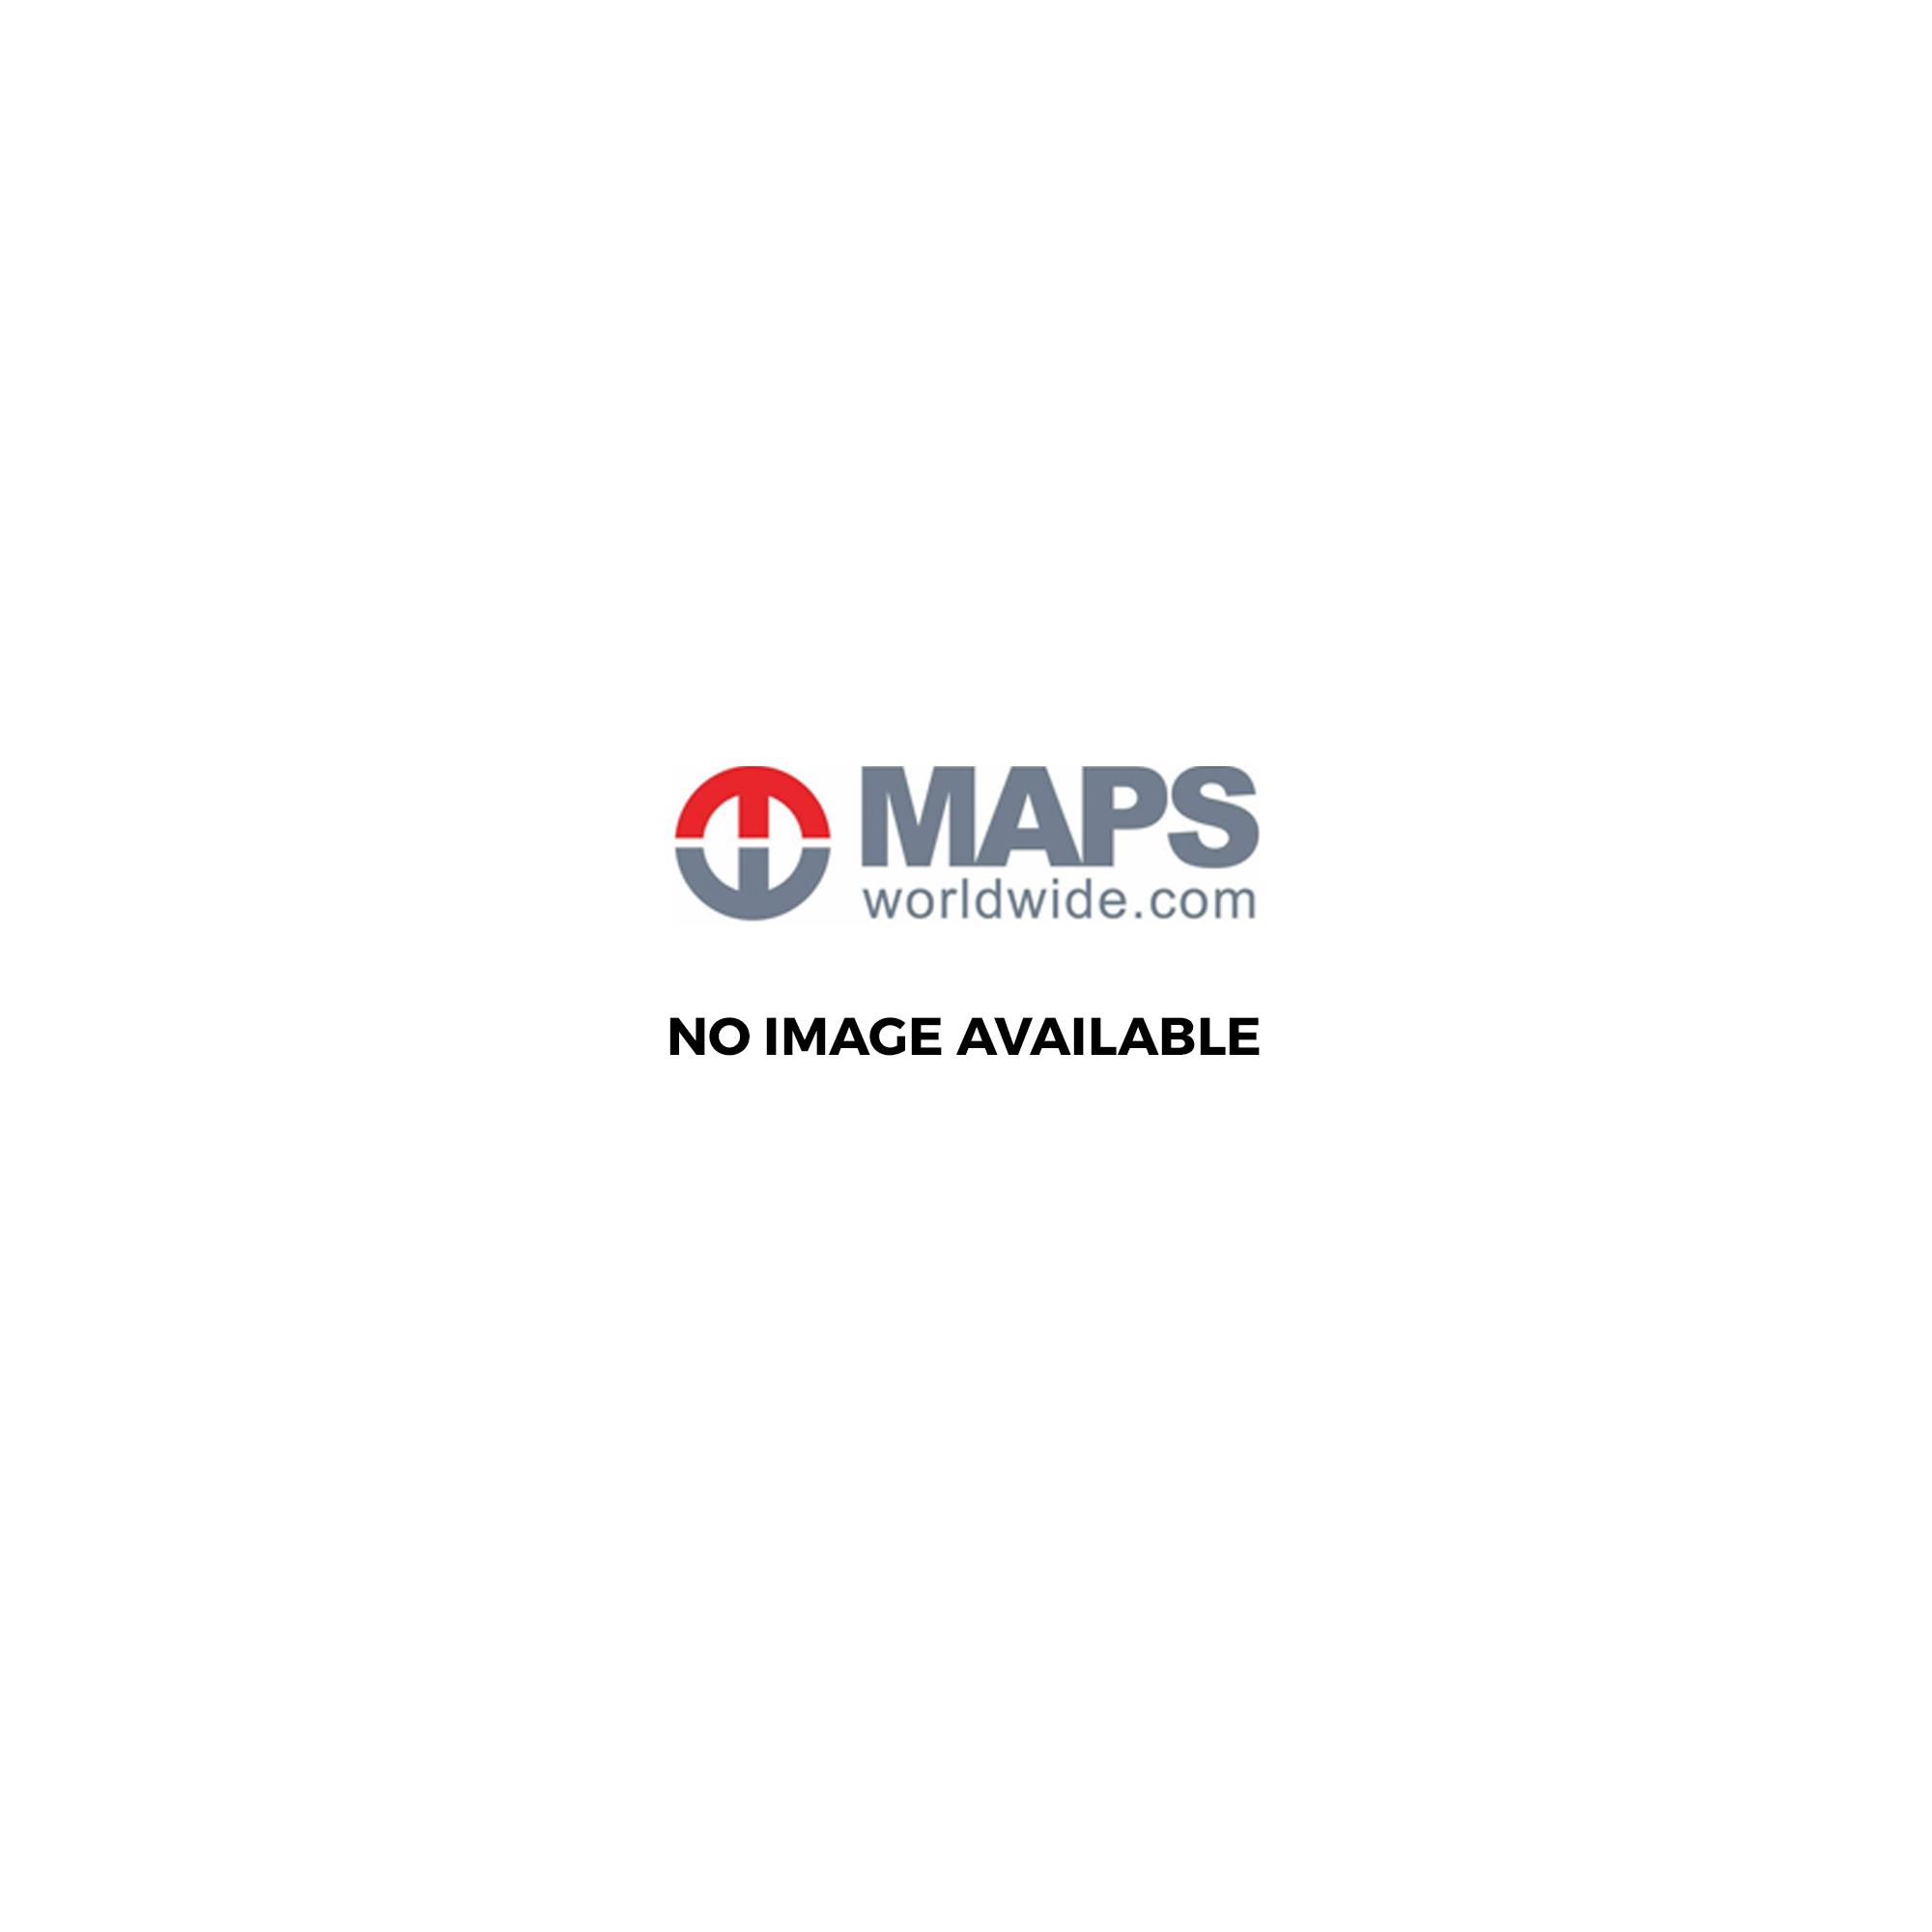 Turkey Central & Cappadocia Travel Map on ardahan map, ankara map, dolmabahce palace map, pamukkale map, carpathian mountains map, anatolia map, turkey map, tatev monastery map, kayseri map, lycian sea map, macedonia map, bitlis map, nevsehir pazar map, cilicia map, underground city, mount nemrut, campania map, pontus map, troy map, goreme map, mount ararat, derinkuyu underground city, phthia map, ephesus map,